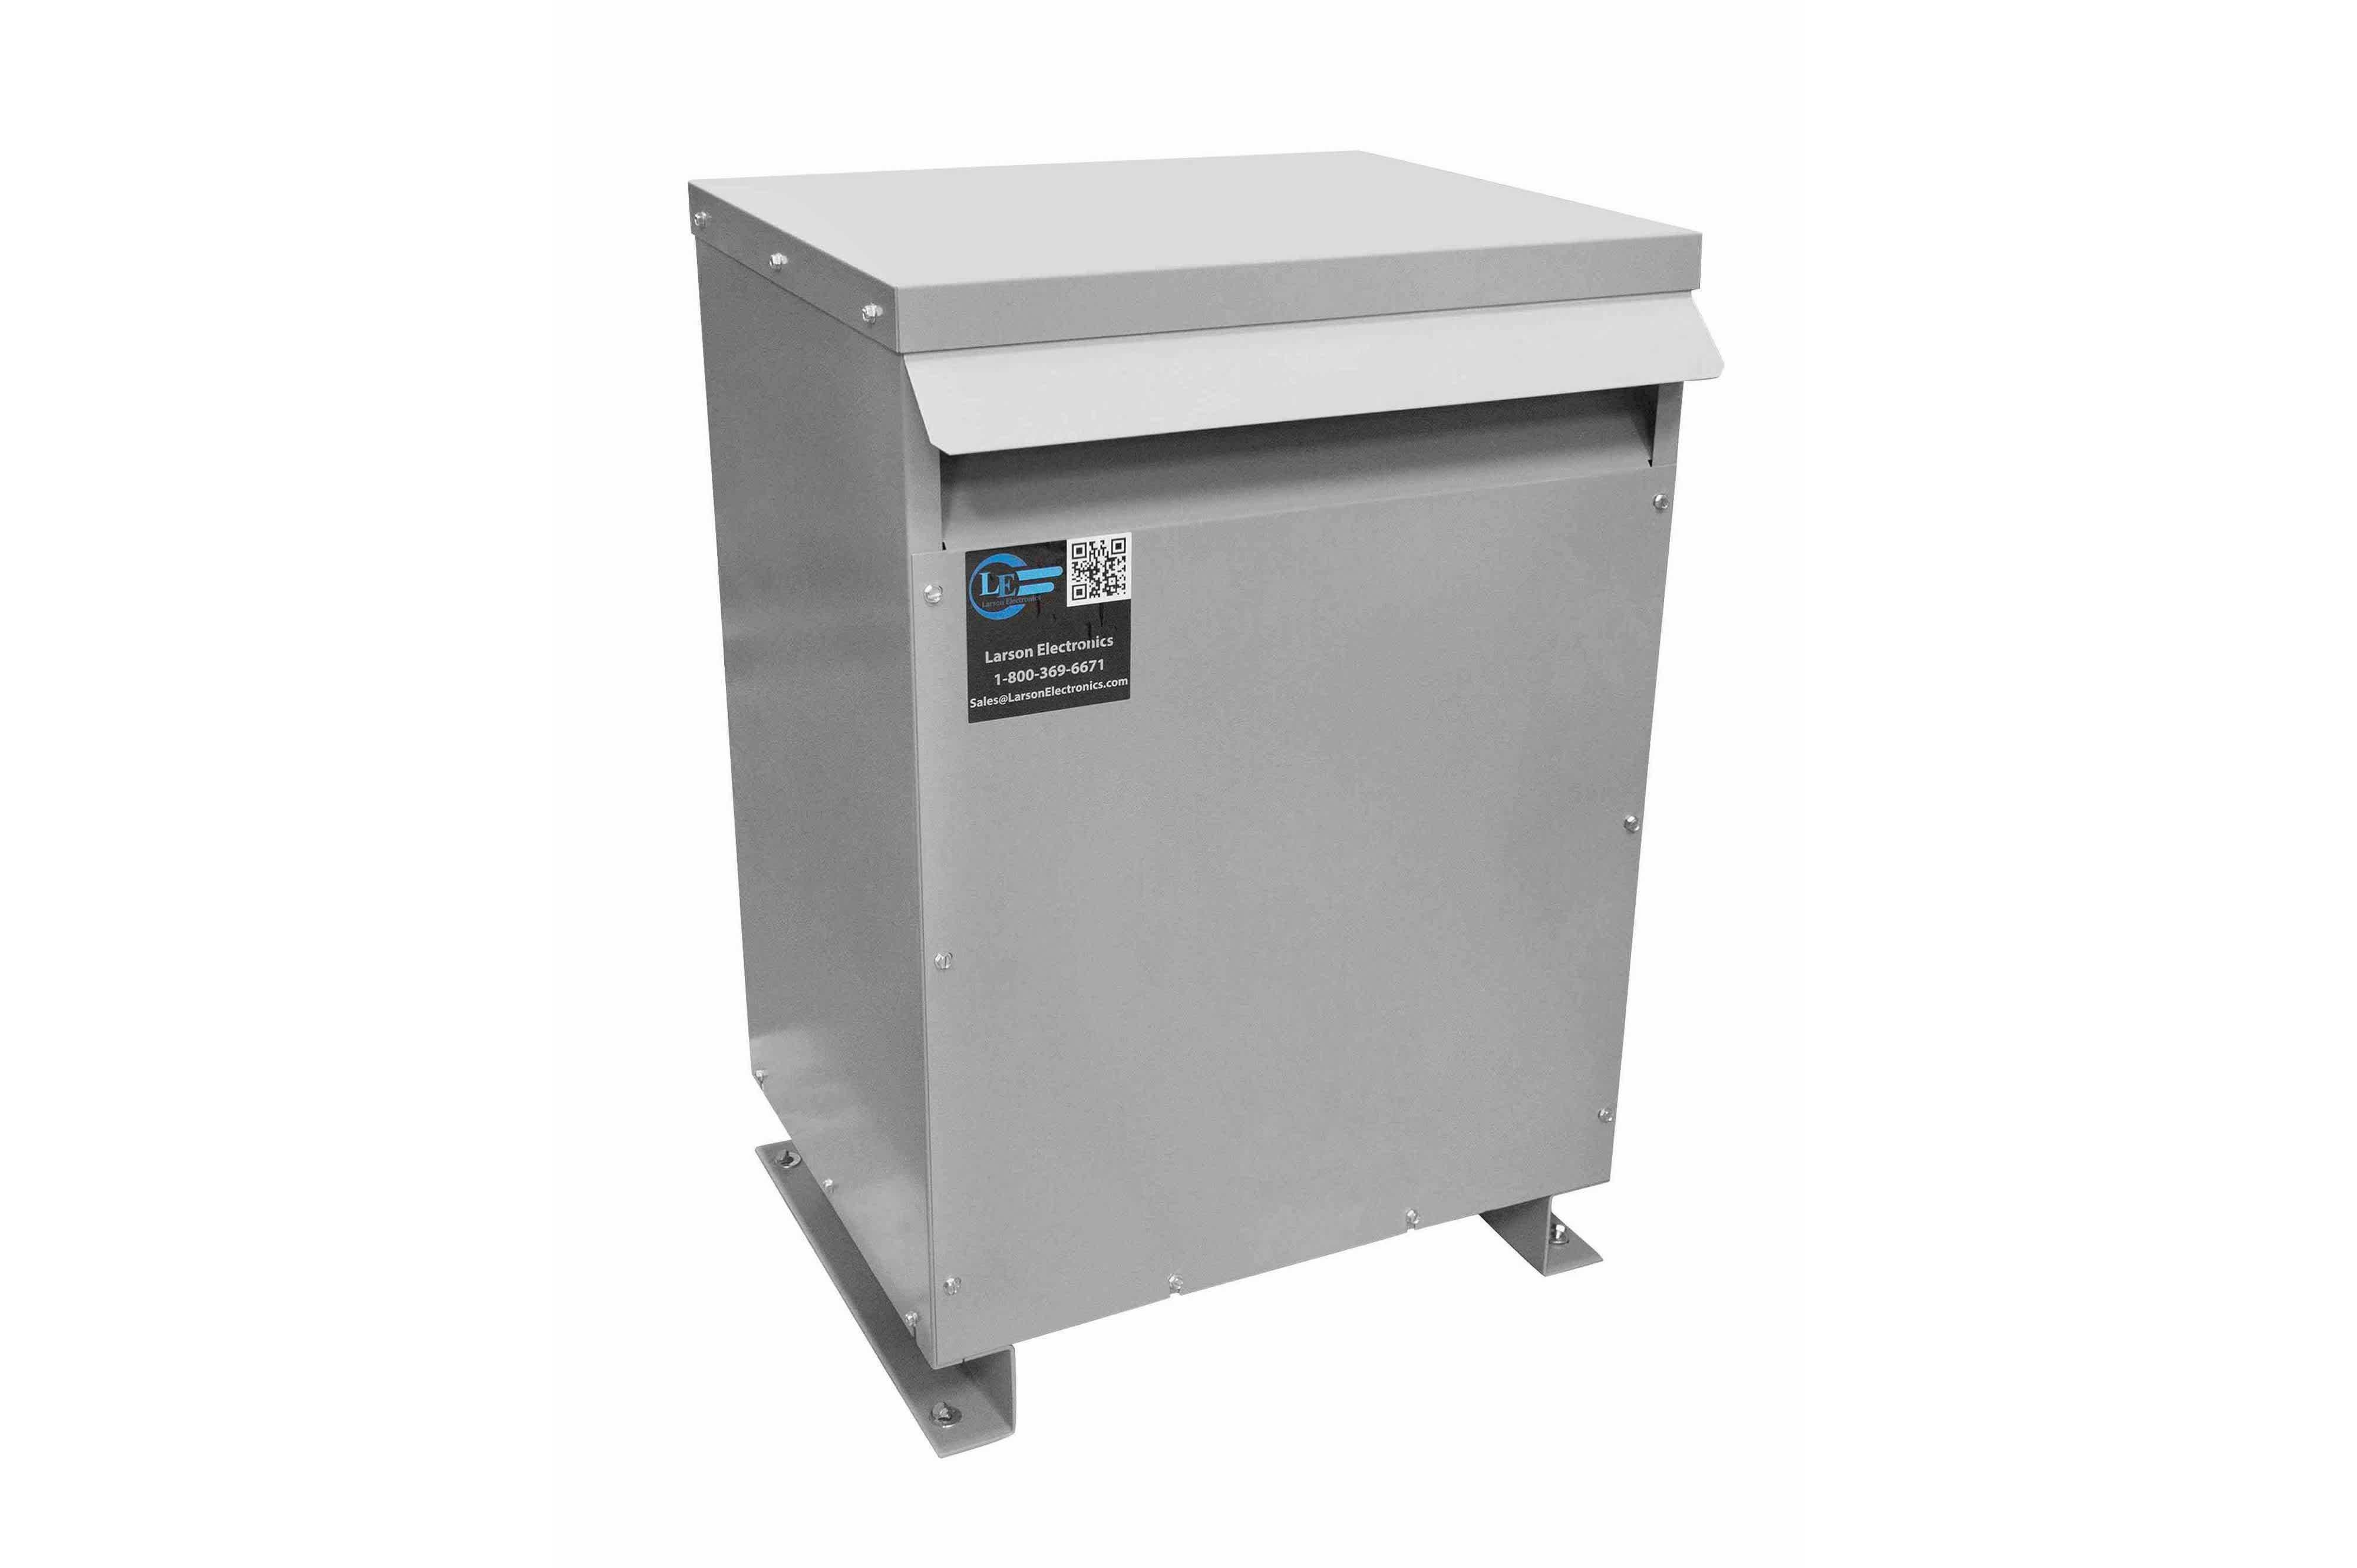 167 kVA 3PH DOE Transformer, 600V Delta Primary, 380Y/220 Wye-N Secondary, N3R, Ventilated, 60 Hz